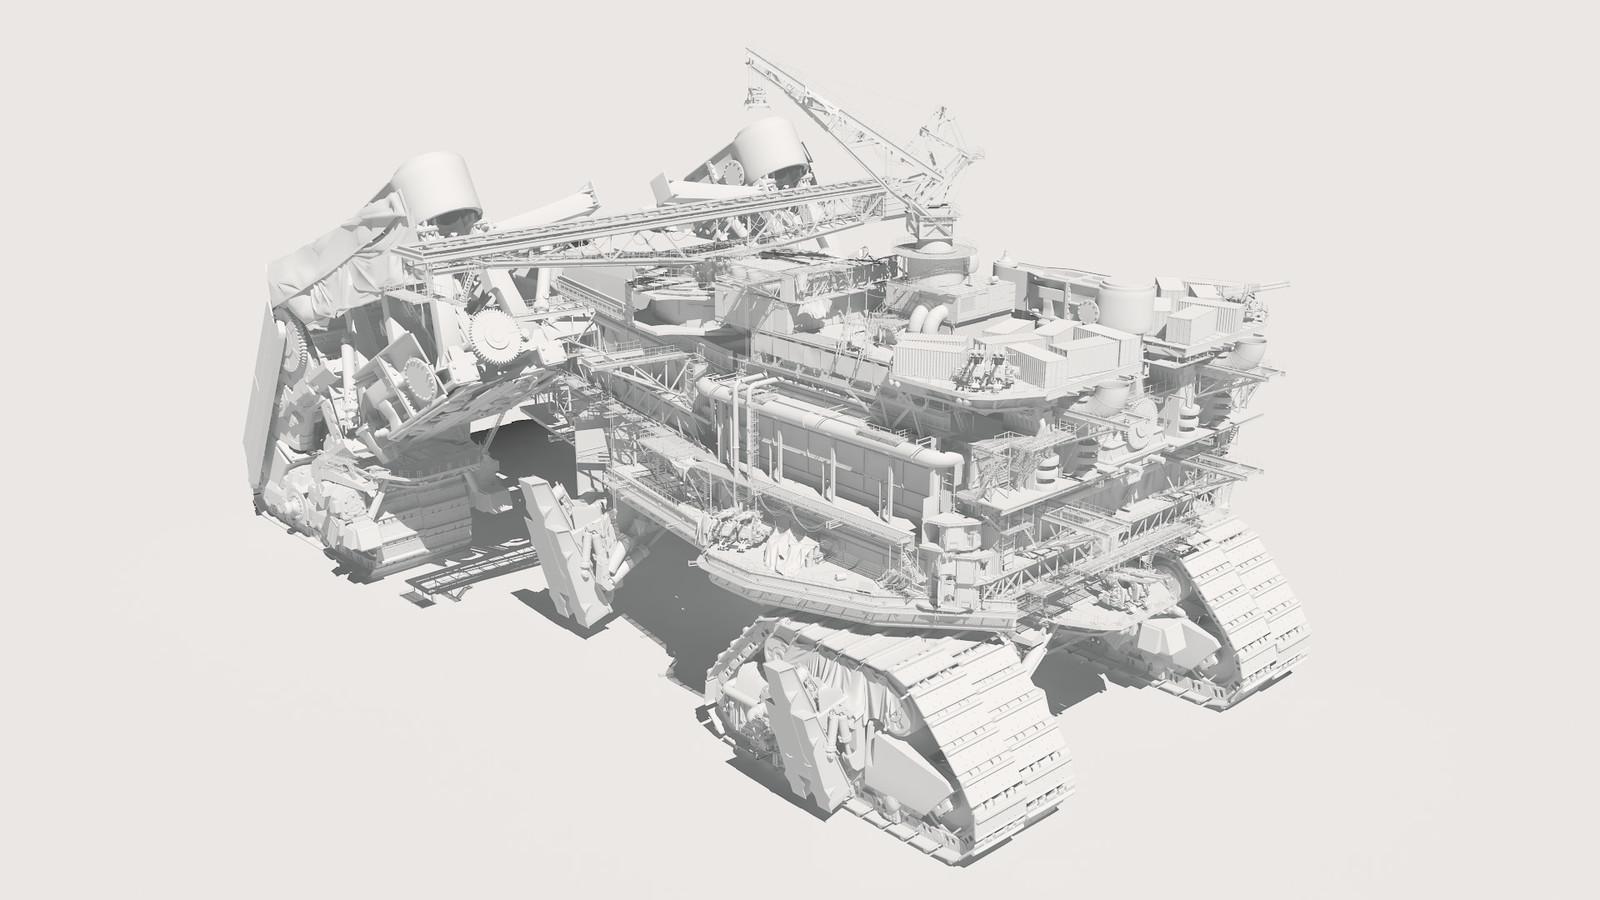 Runaway - Salt-Eater Model